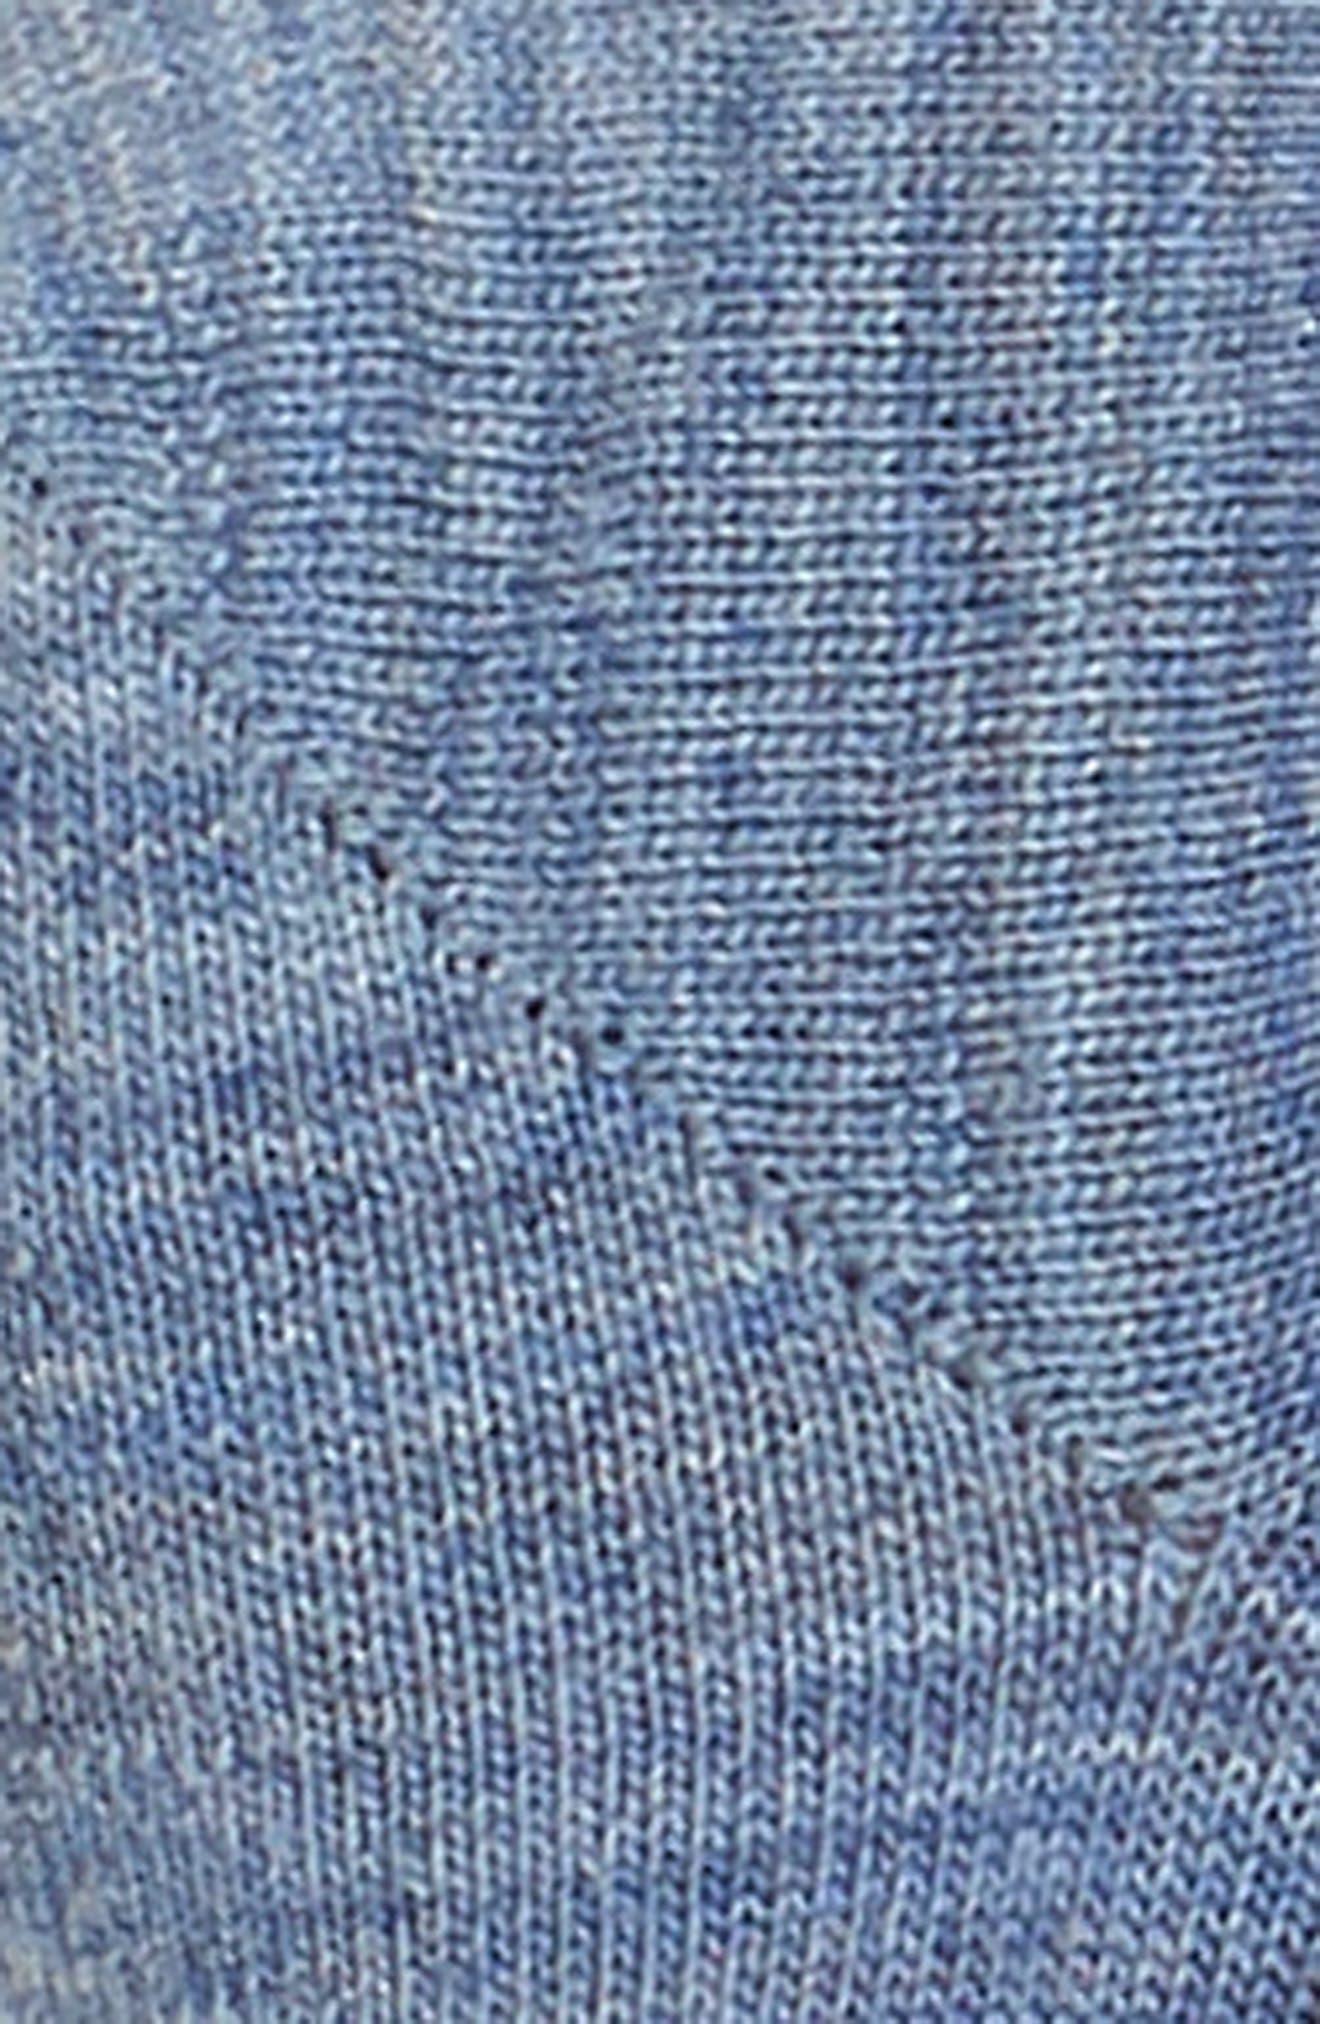 'Hide and Seek' No-Show Socks,                             Alternate thumbnail 2, color,                             Blue Steel